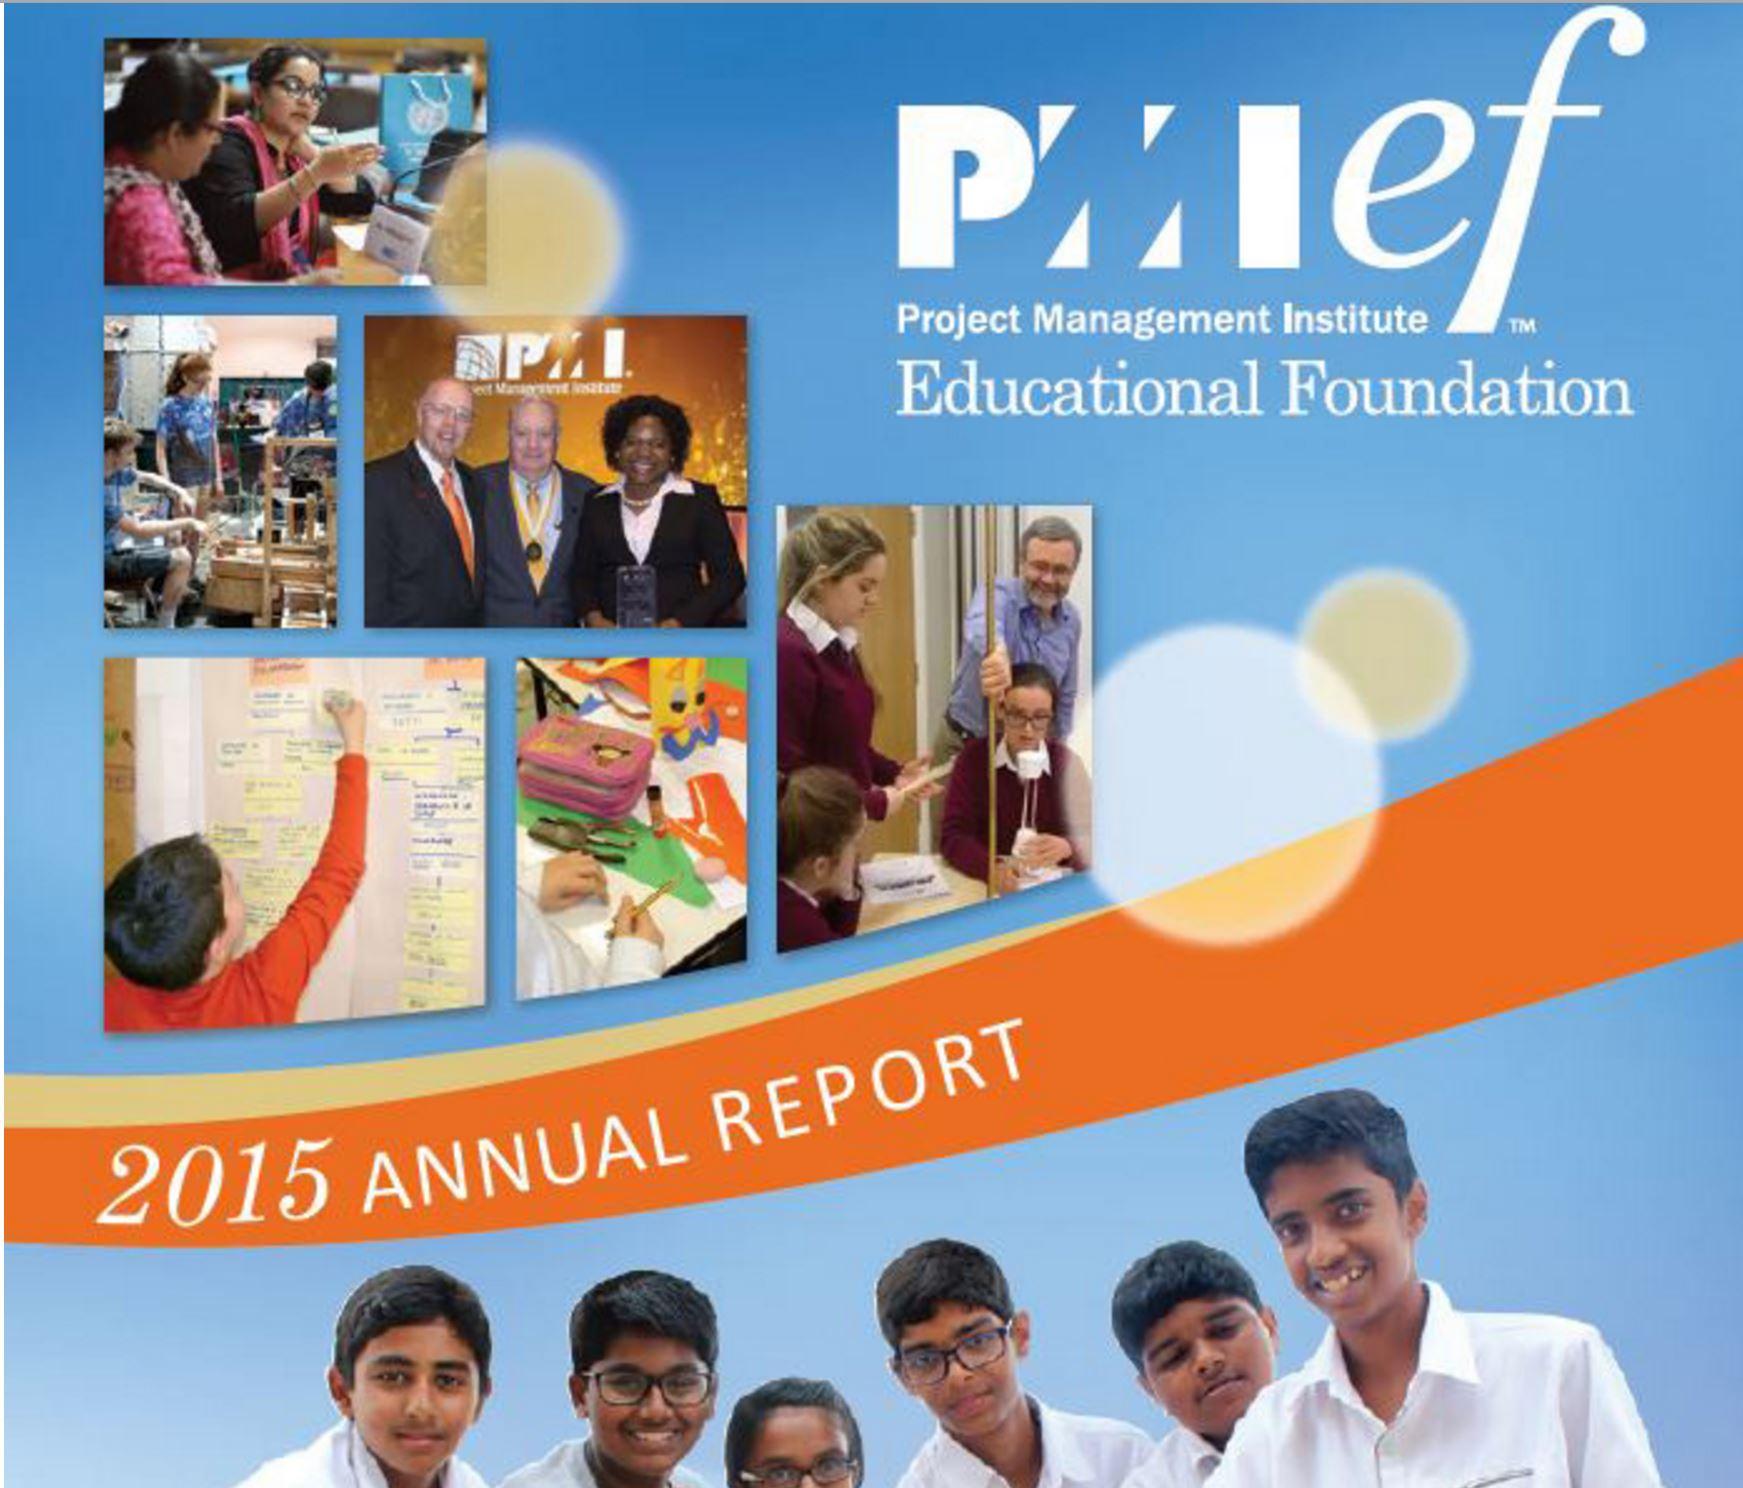 pmief-report2015.jpg